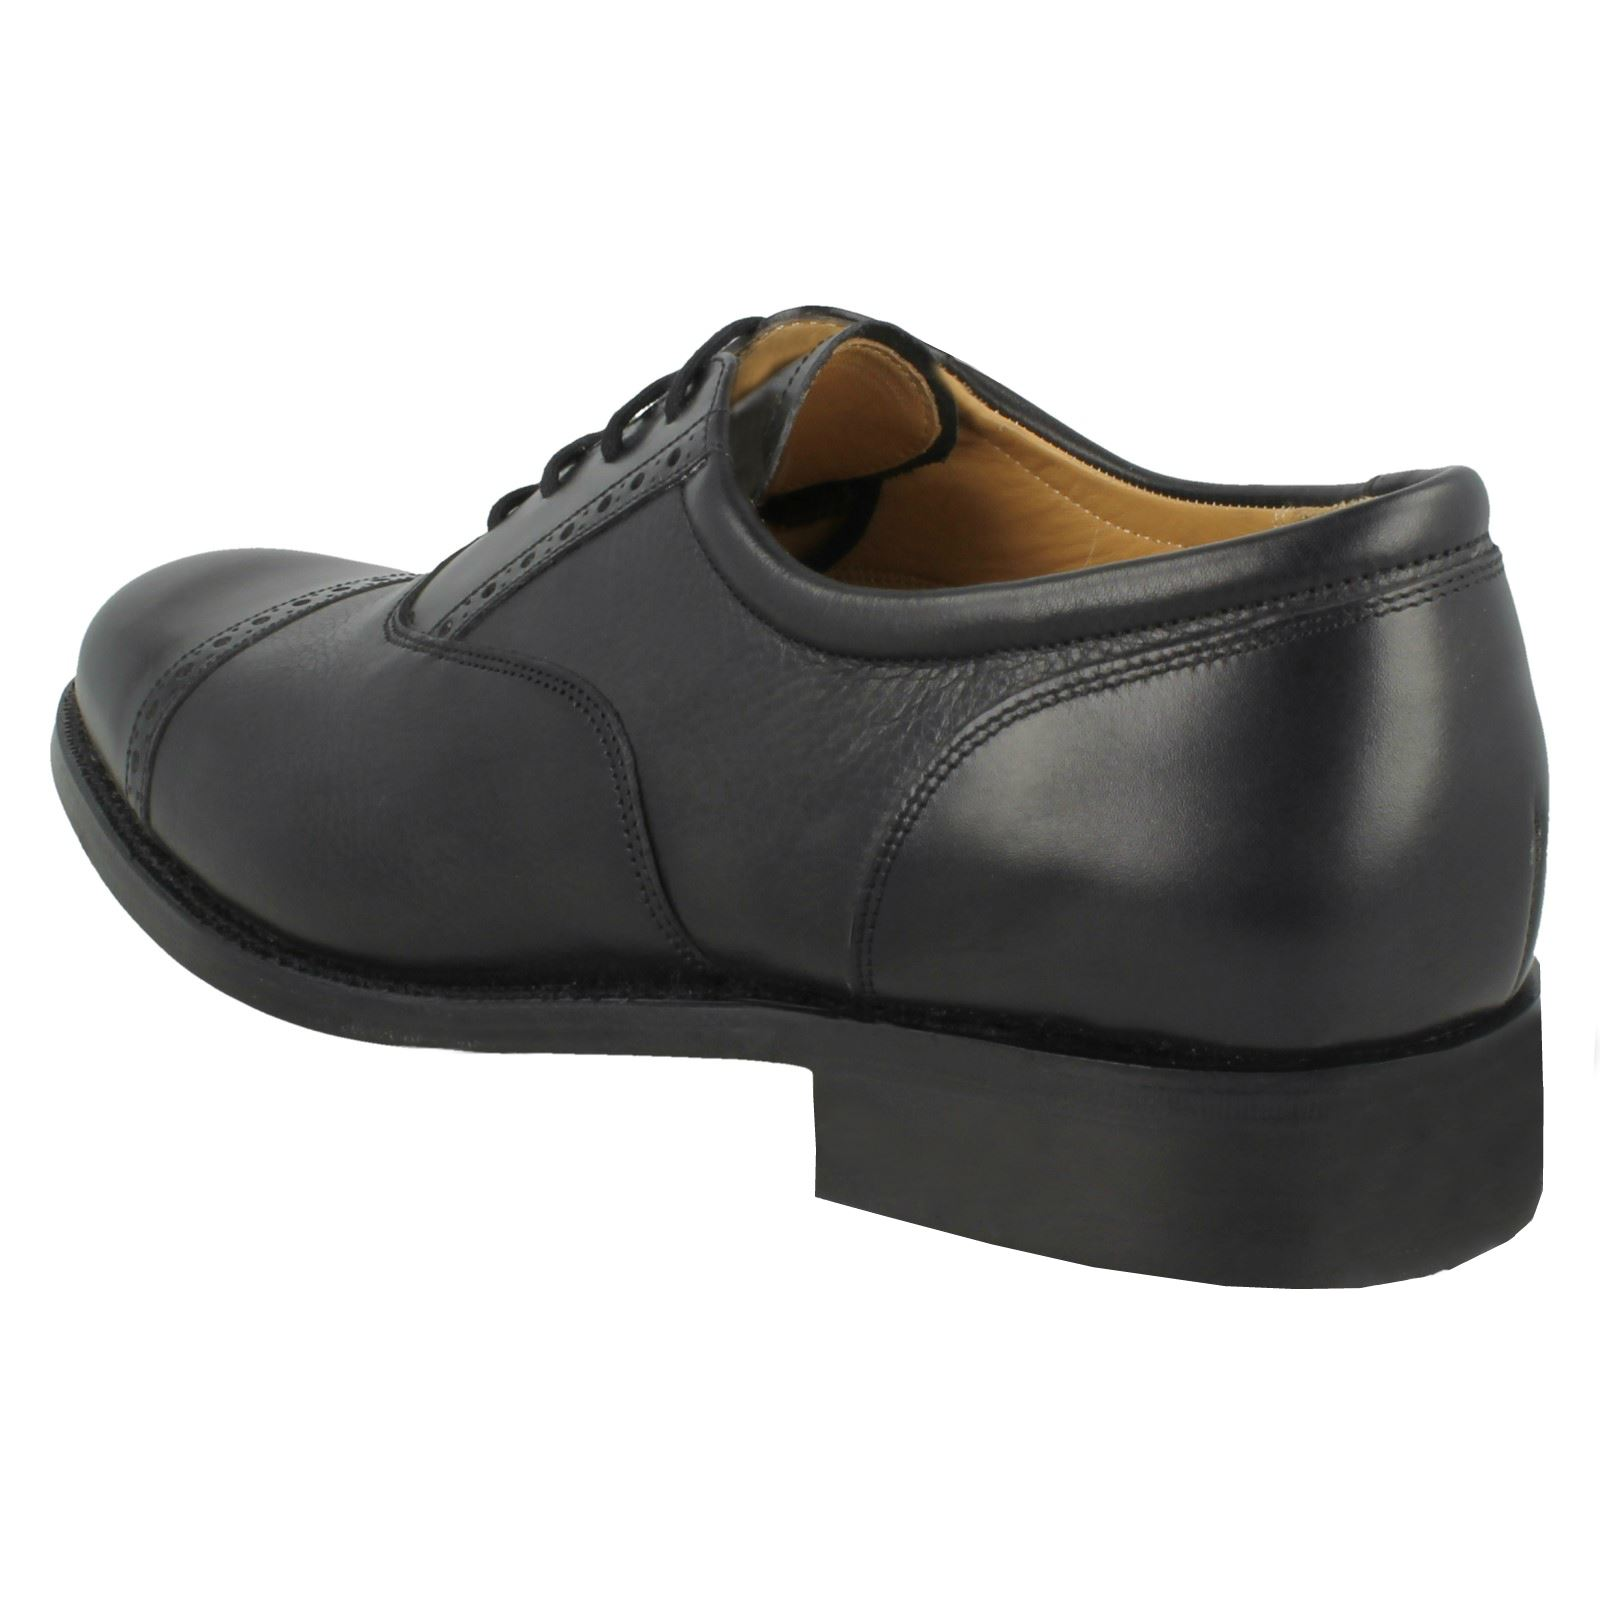 Billig Mens gute Qualität Mens Billig Barker Smart Schuhes Shoreham 52264b